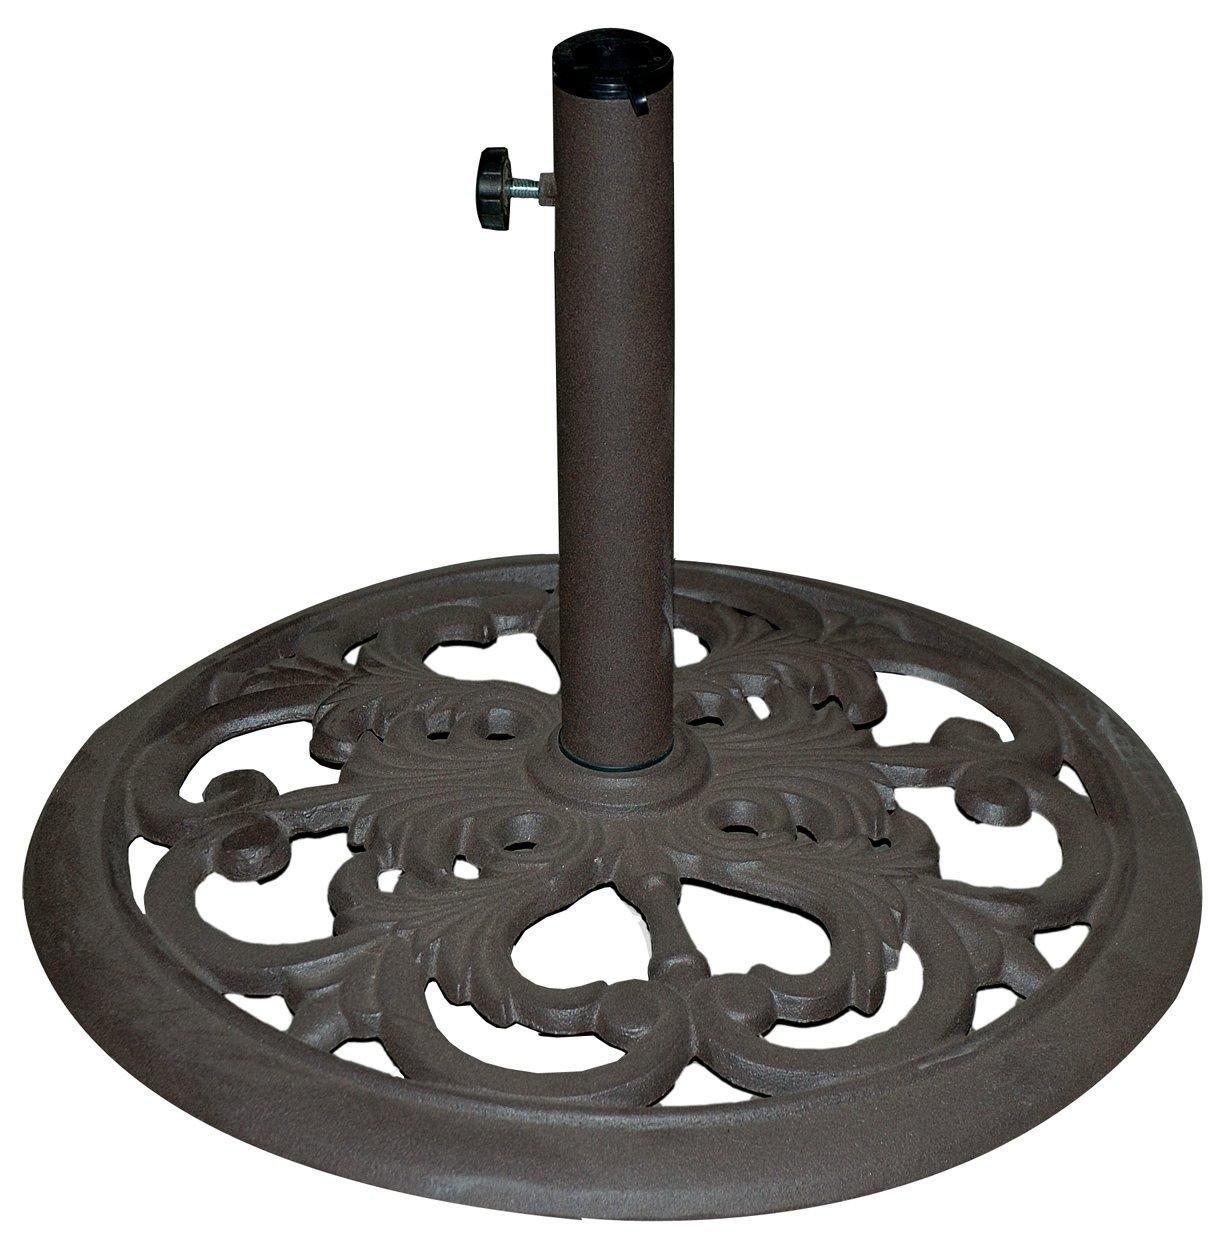 TropiShade 30-Pound Bronze Powder-Coated Cast Iron Umbrella Stand by Tropishade